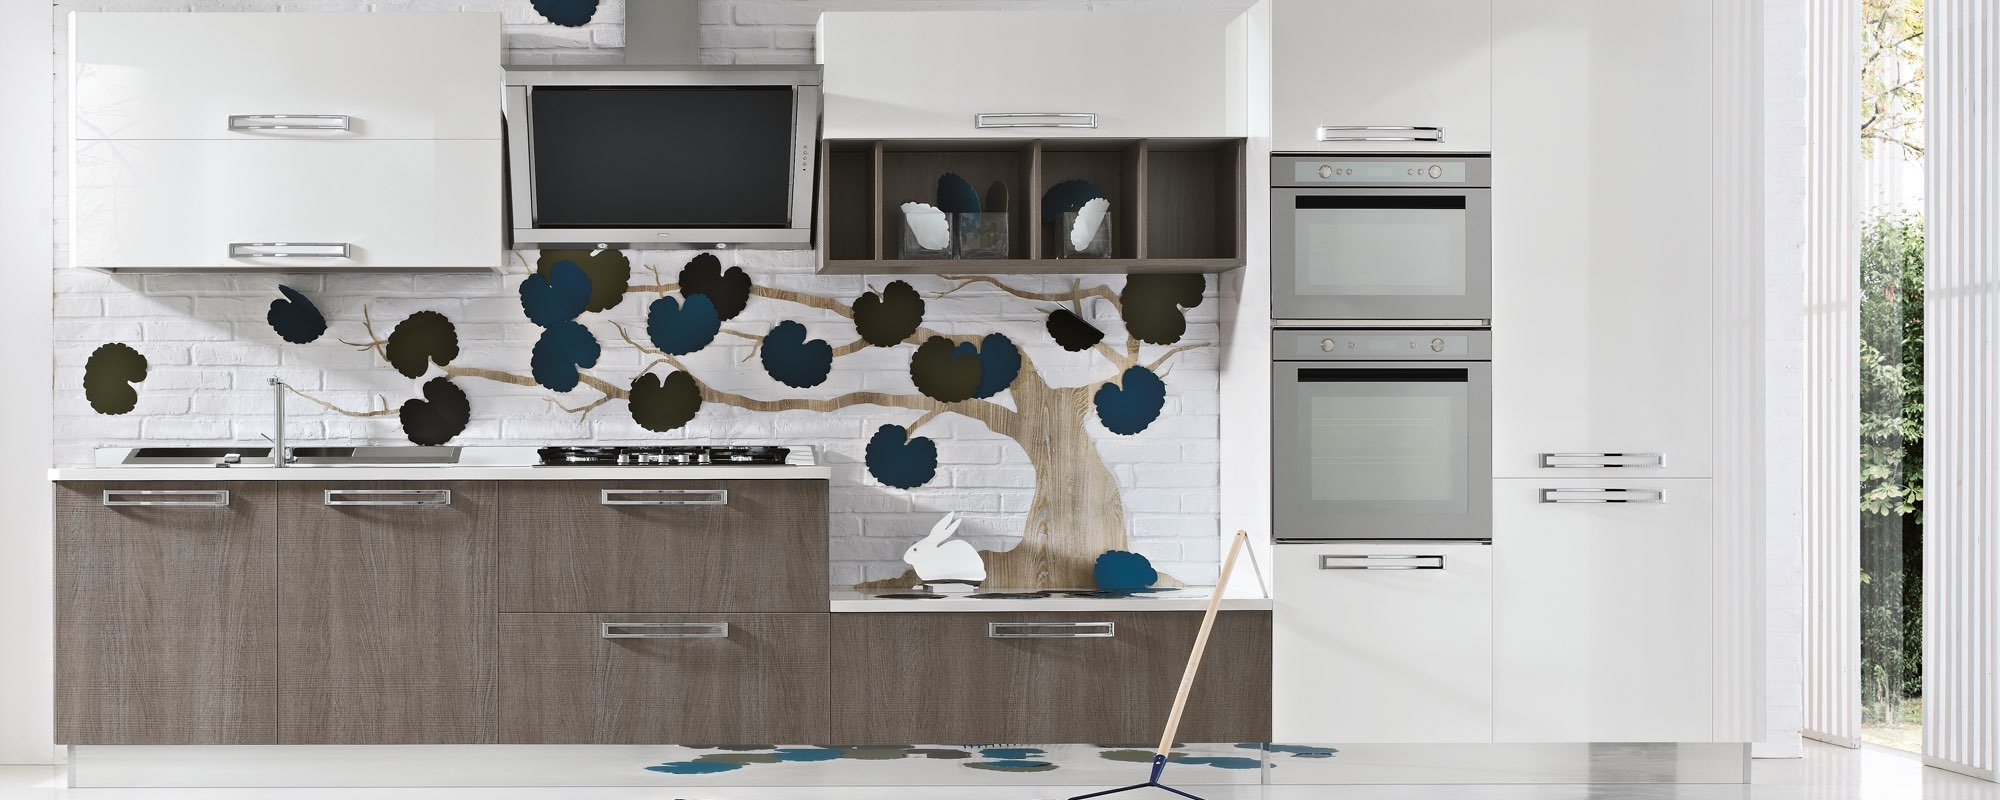 cucina moderna - Milly